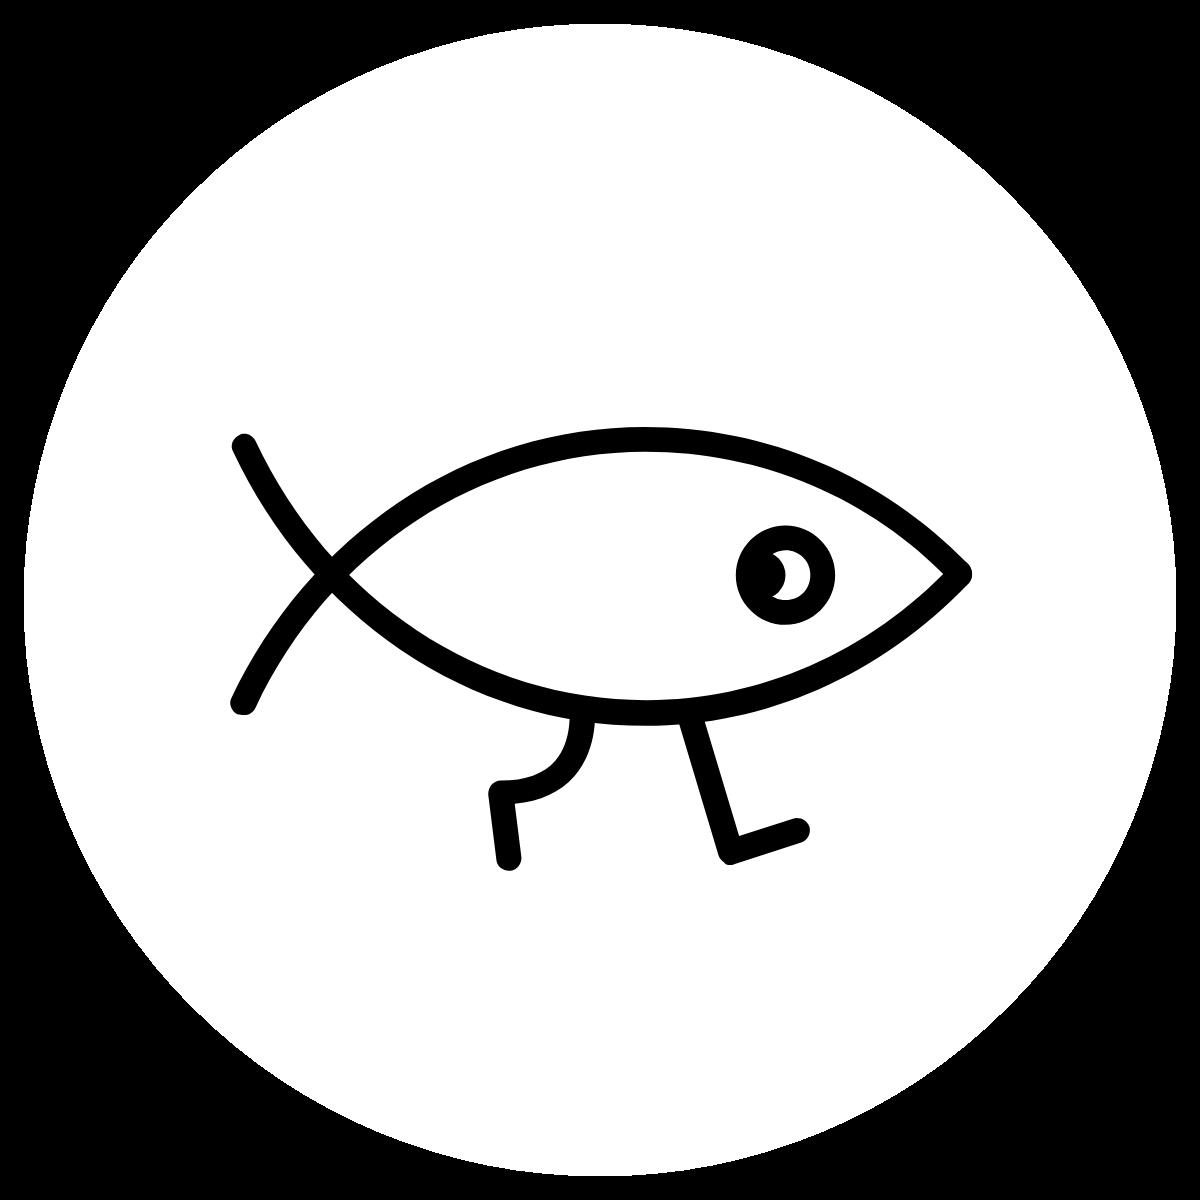 noun_Evolution_1141204 (10).png